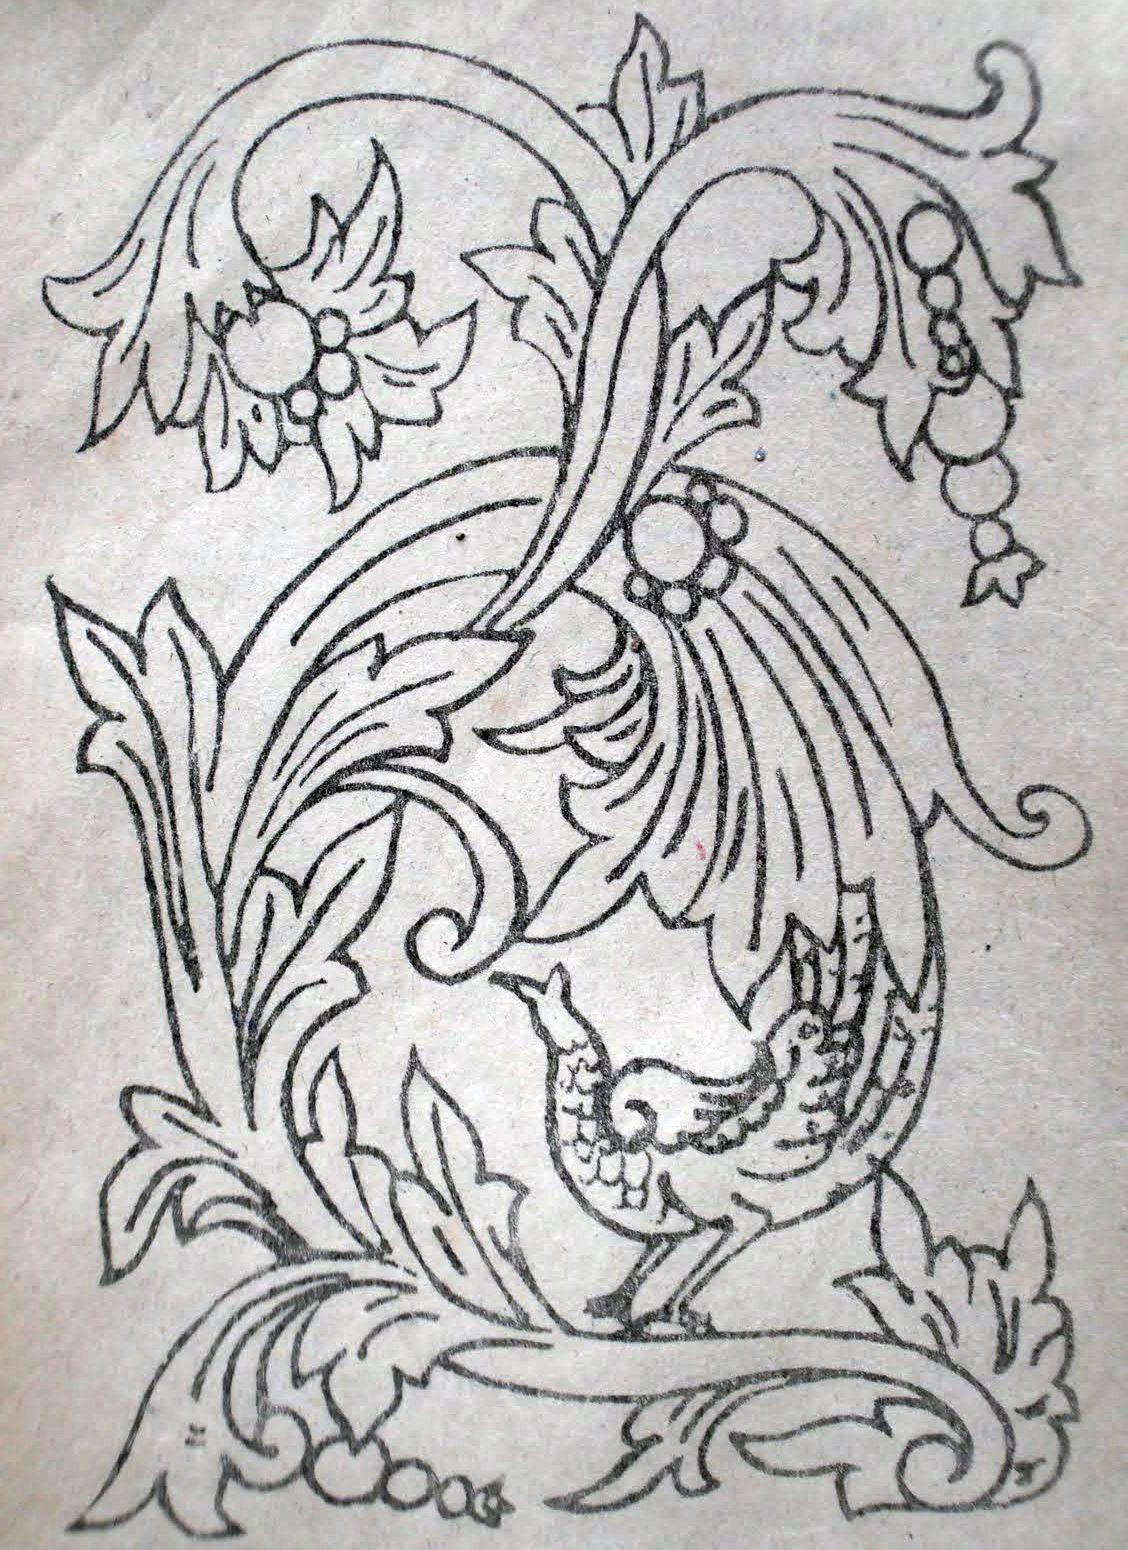 Motif Ragam Hias Nusantara : motif, ragam, nusantara, Project:, RAGAM, ORNAMEN, NUSANTARA, Ornamen,, Bordir,, Gambar